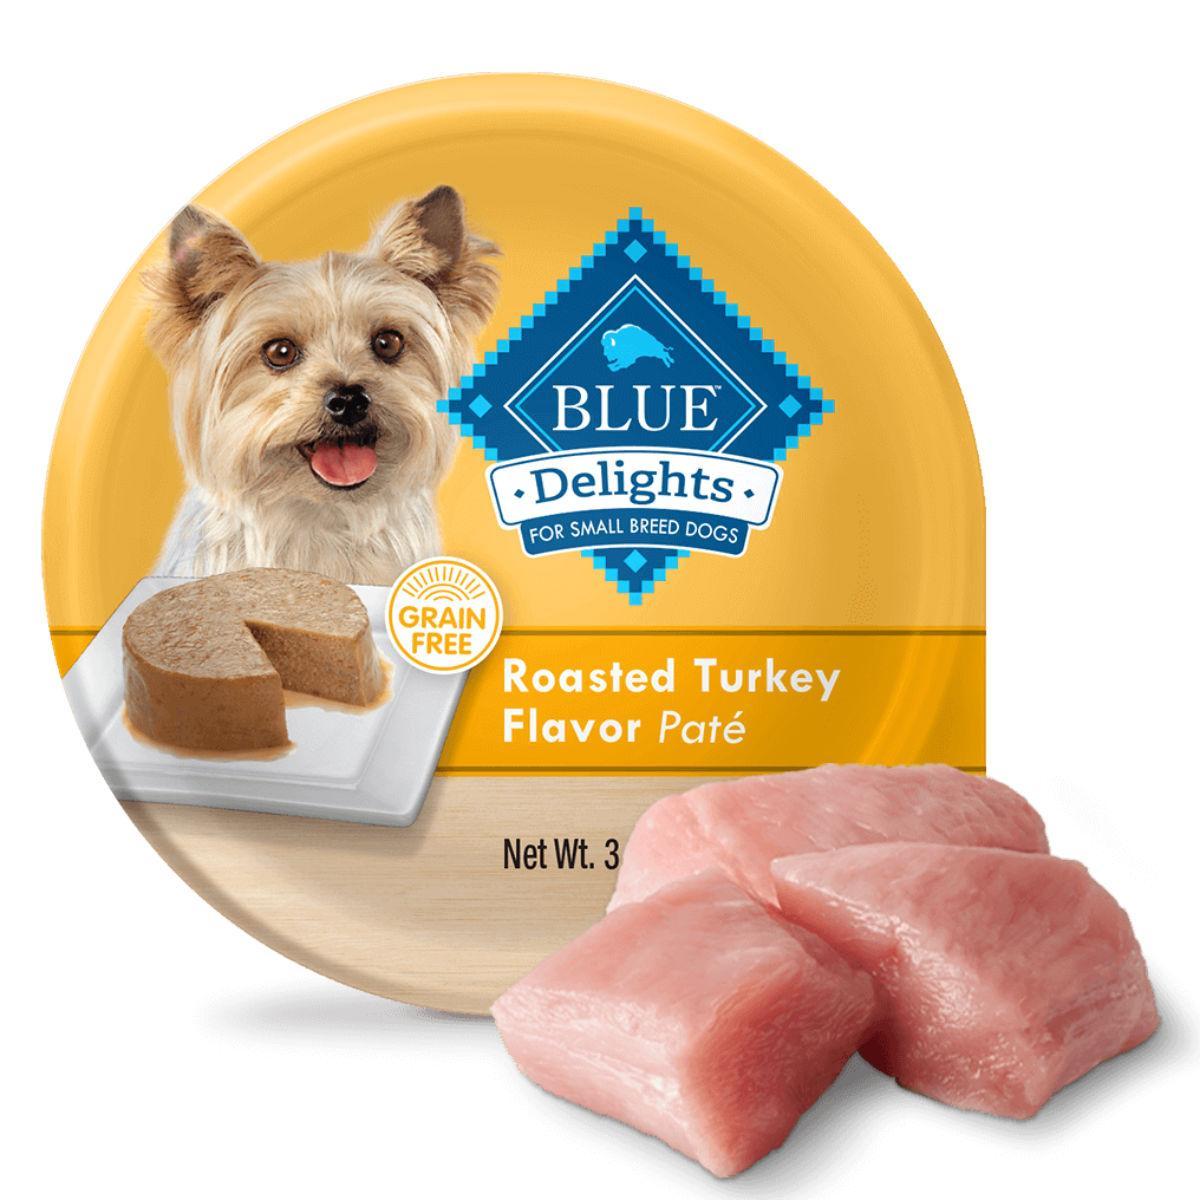 Blue Buffalo Divine Delights Small Breed Dog Food - Roasted Turkey